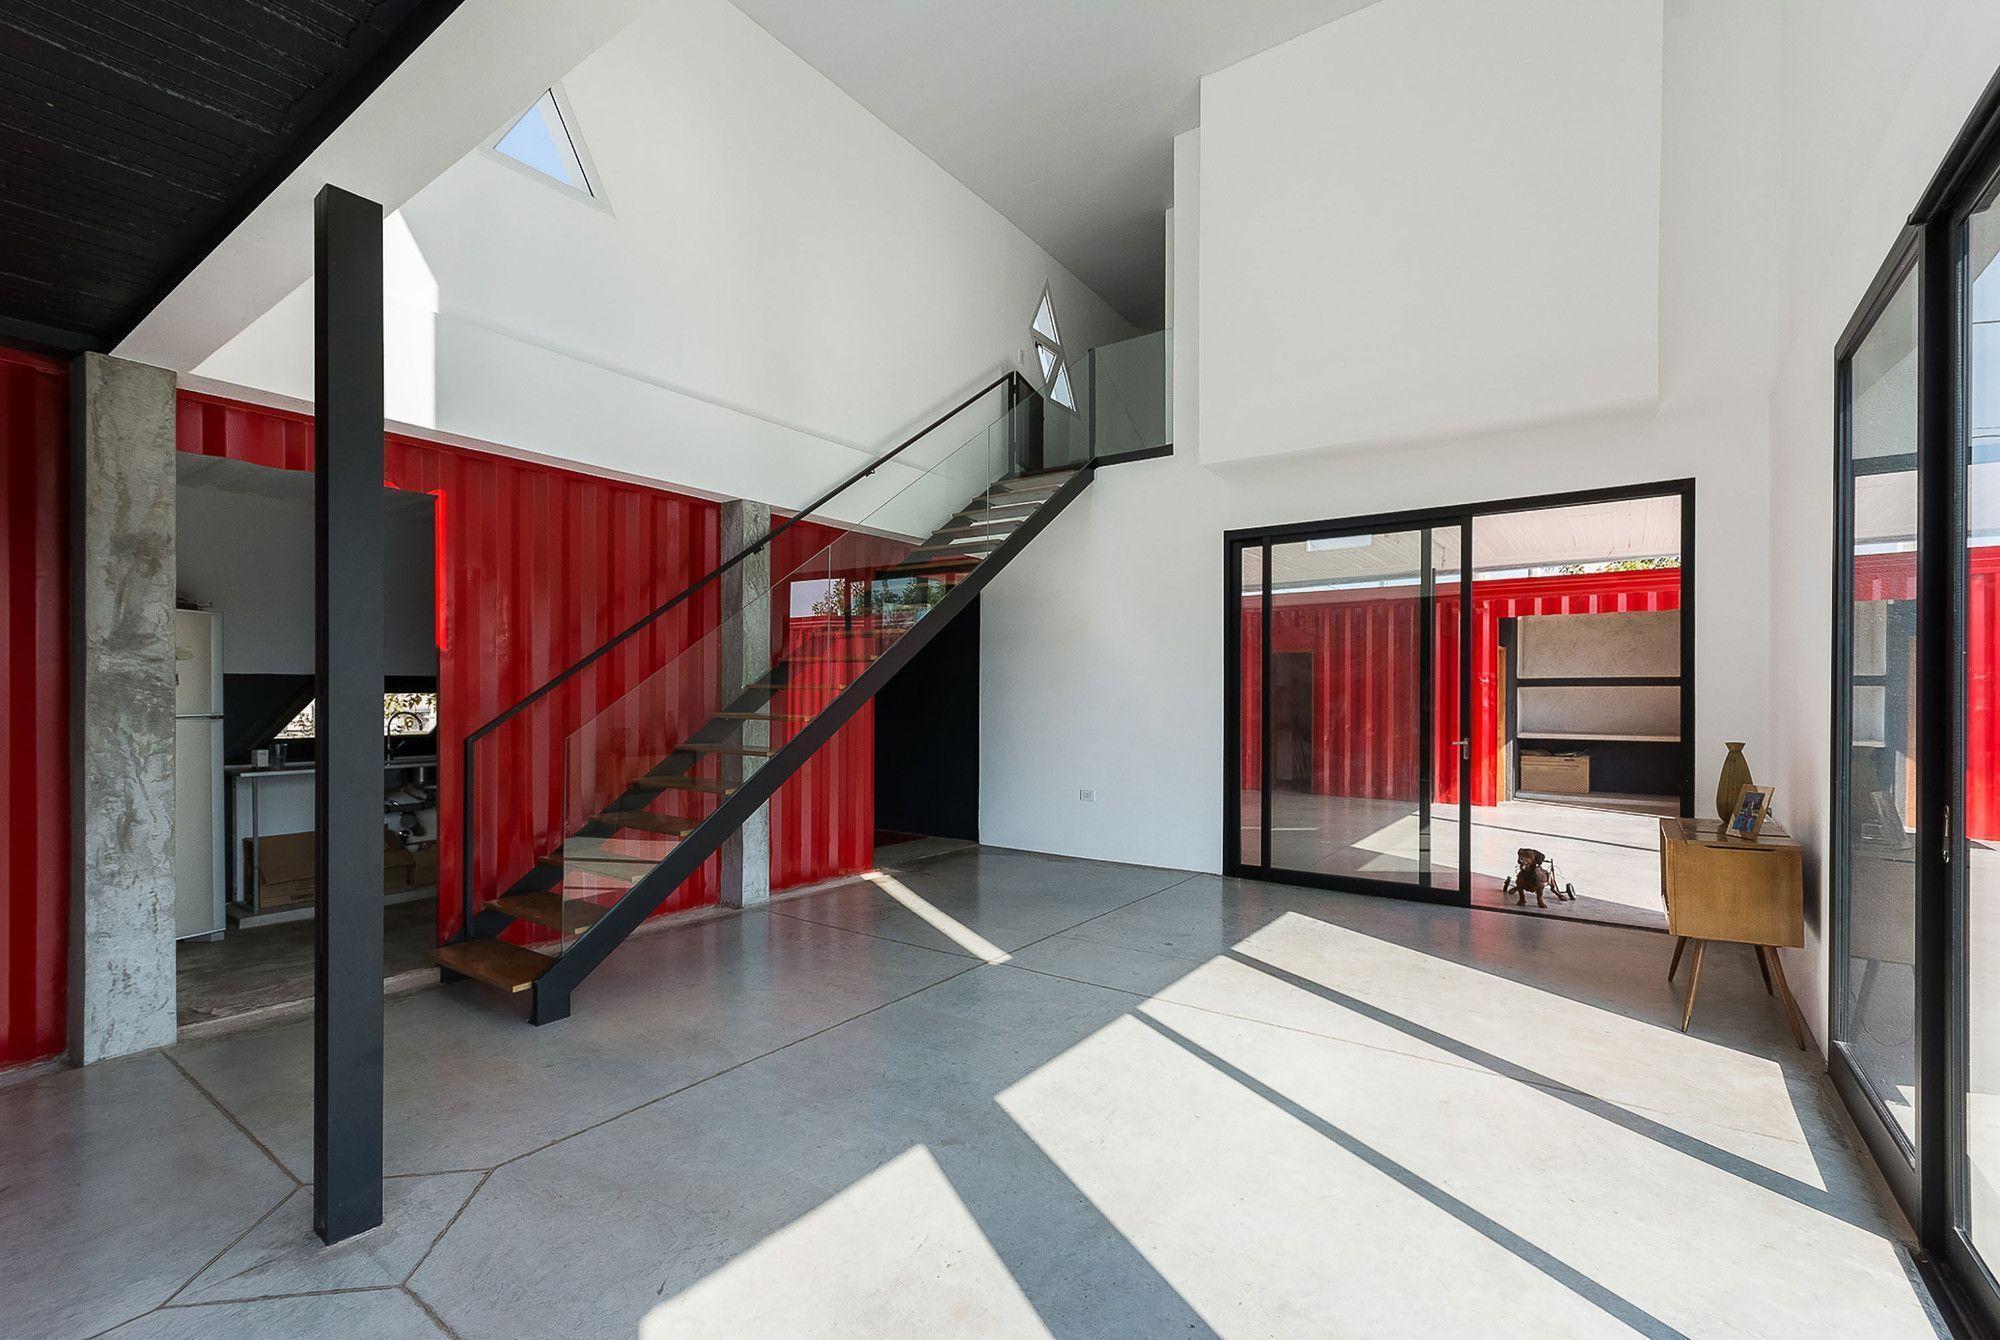 "Foto: Reprodução / <a href=""http://www.archdaily.com.br/br/767378/casa-container-jose-schreiber-arquitecto"" target=""_blank"">José Schreiber</a>"